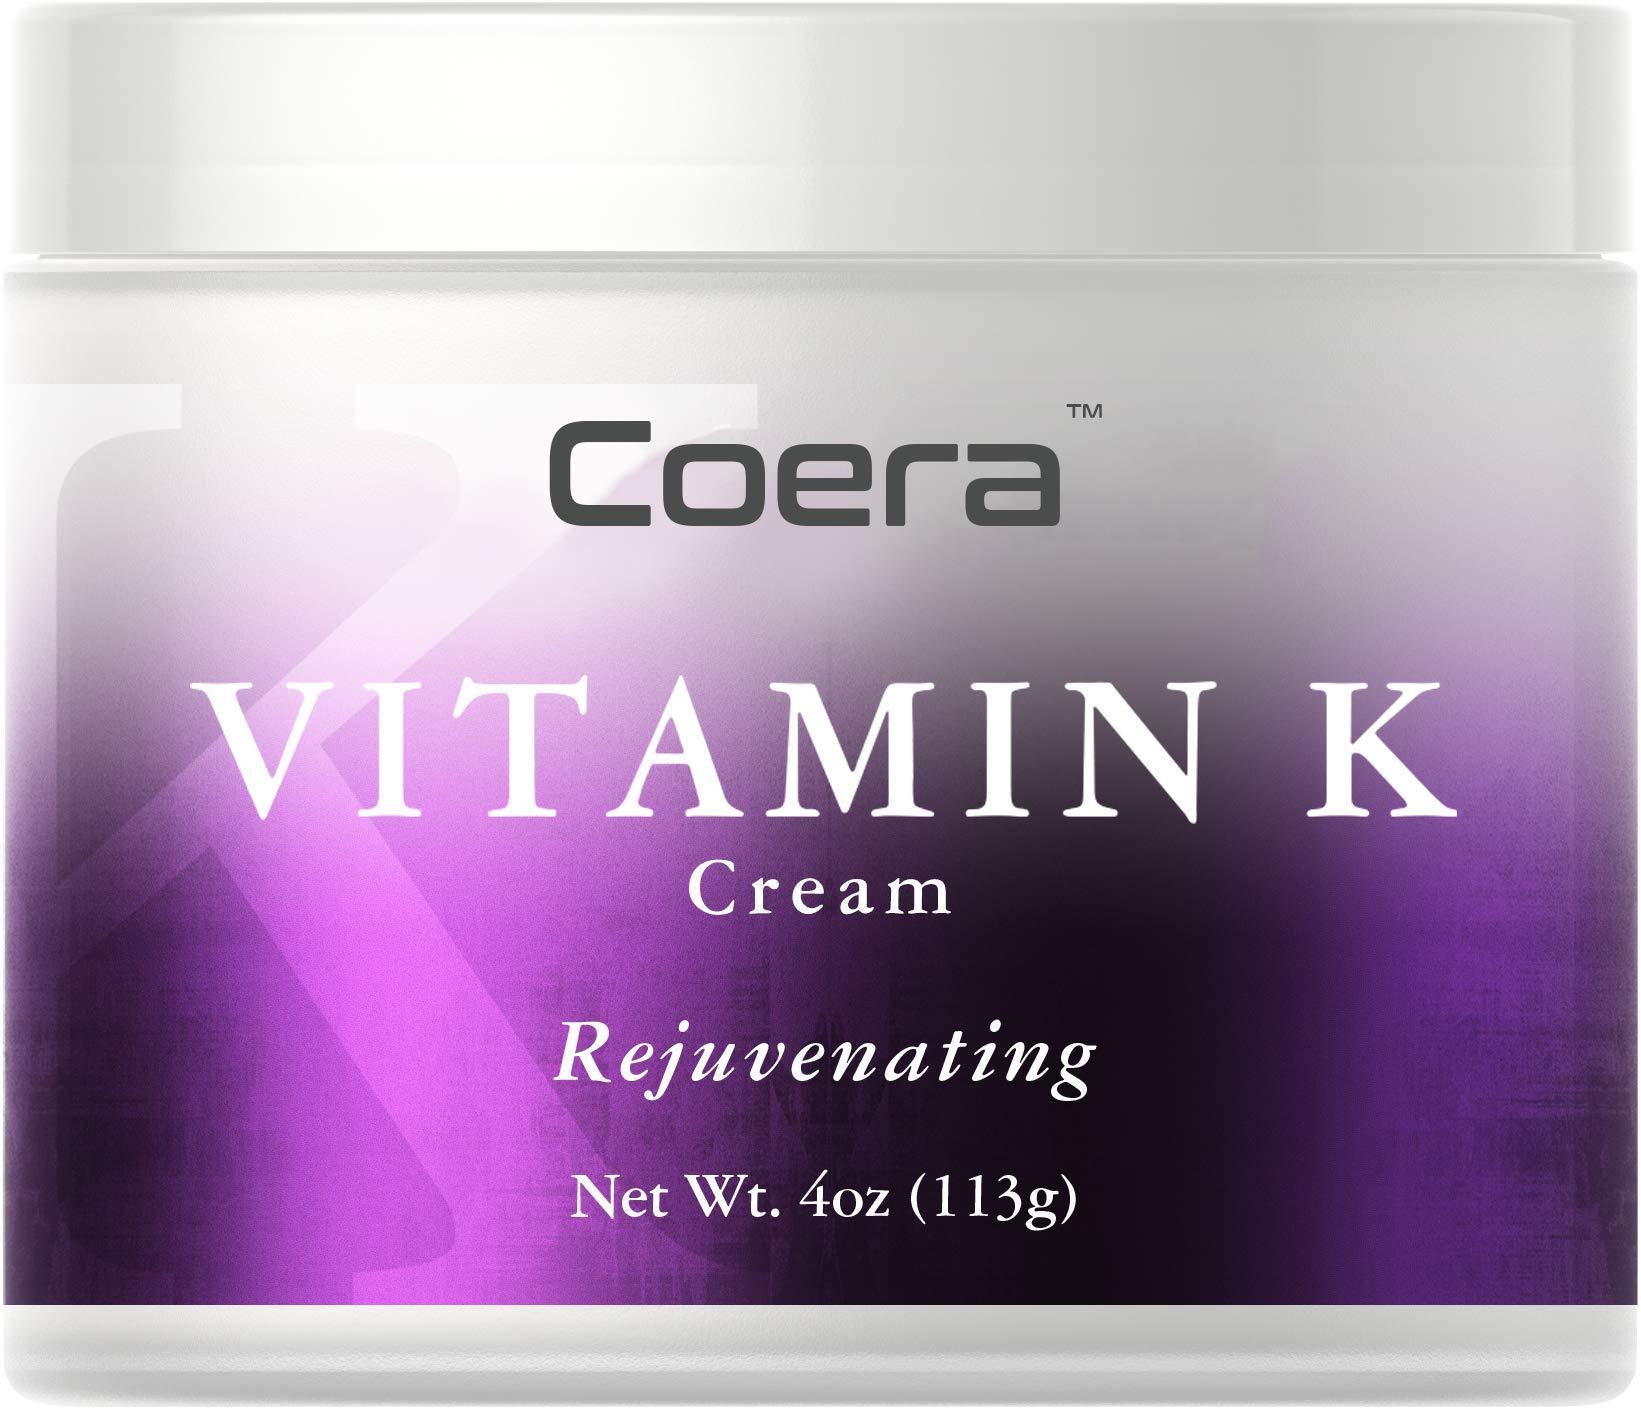 Vitamin K Cream 4 oz   Premium Formula for Bruises, Spider Veins, Dark Circles, Broken Capillaries, Eyes, and Face   Paraben and SLS Free   by Coera